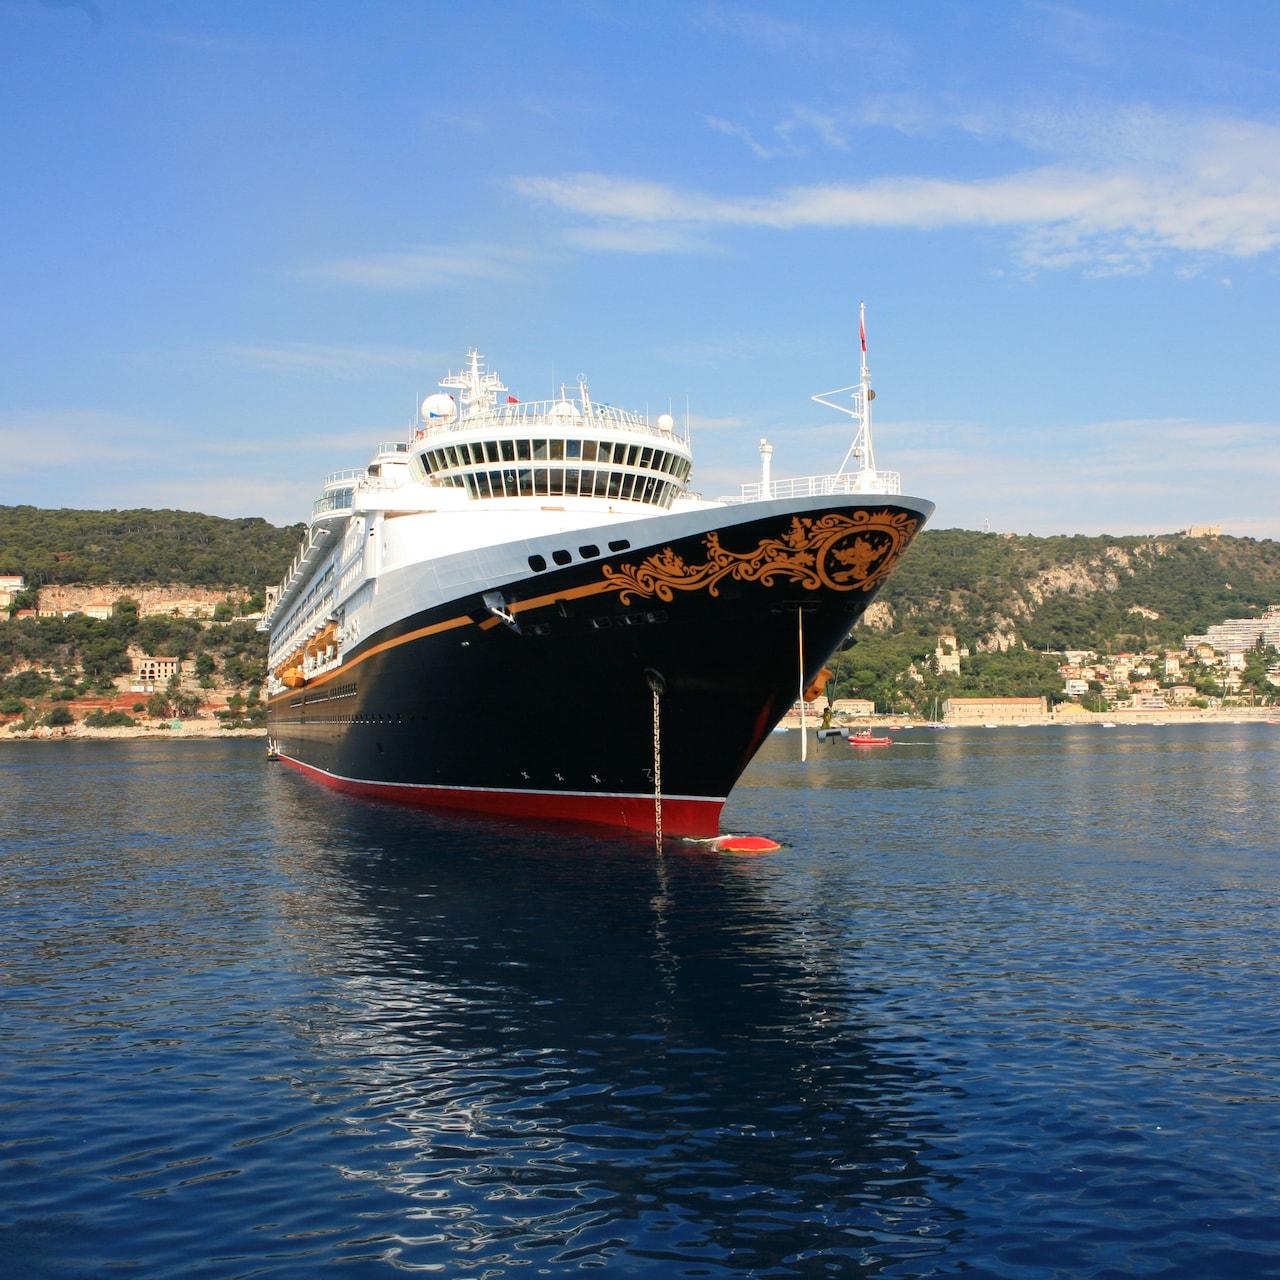 The Disney Cruise Line cruise ship, Disney Magic, anchored off shore